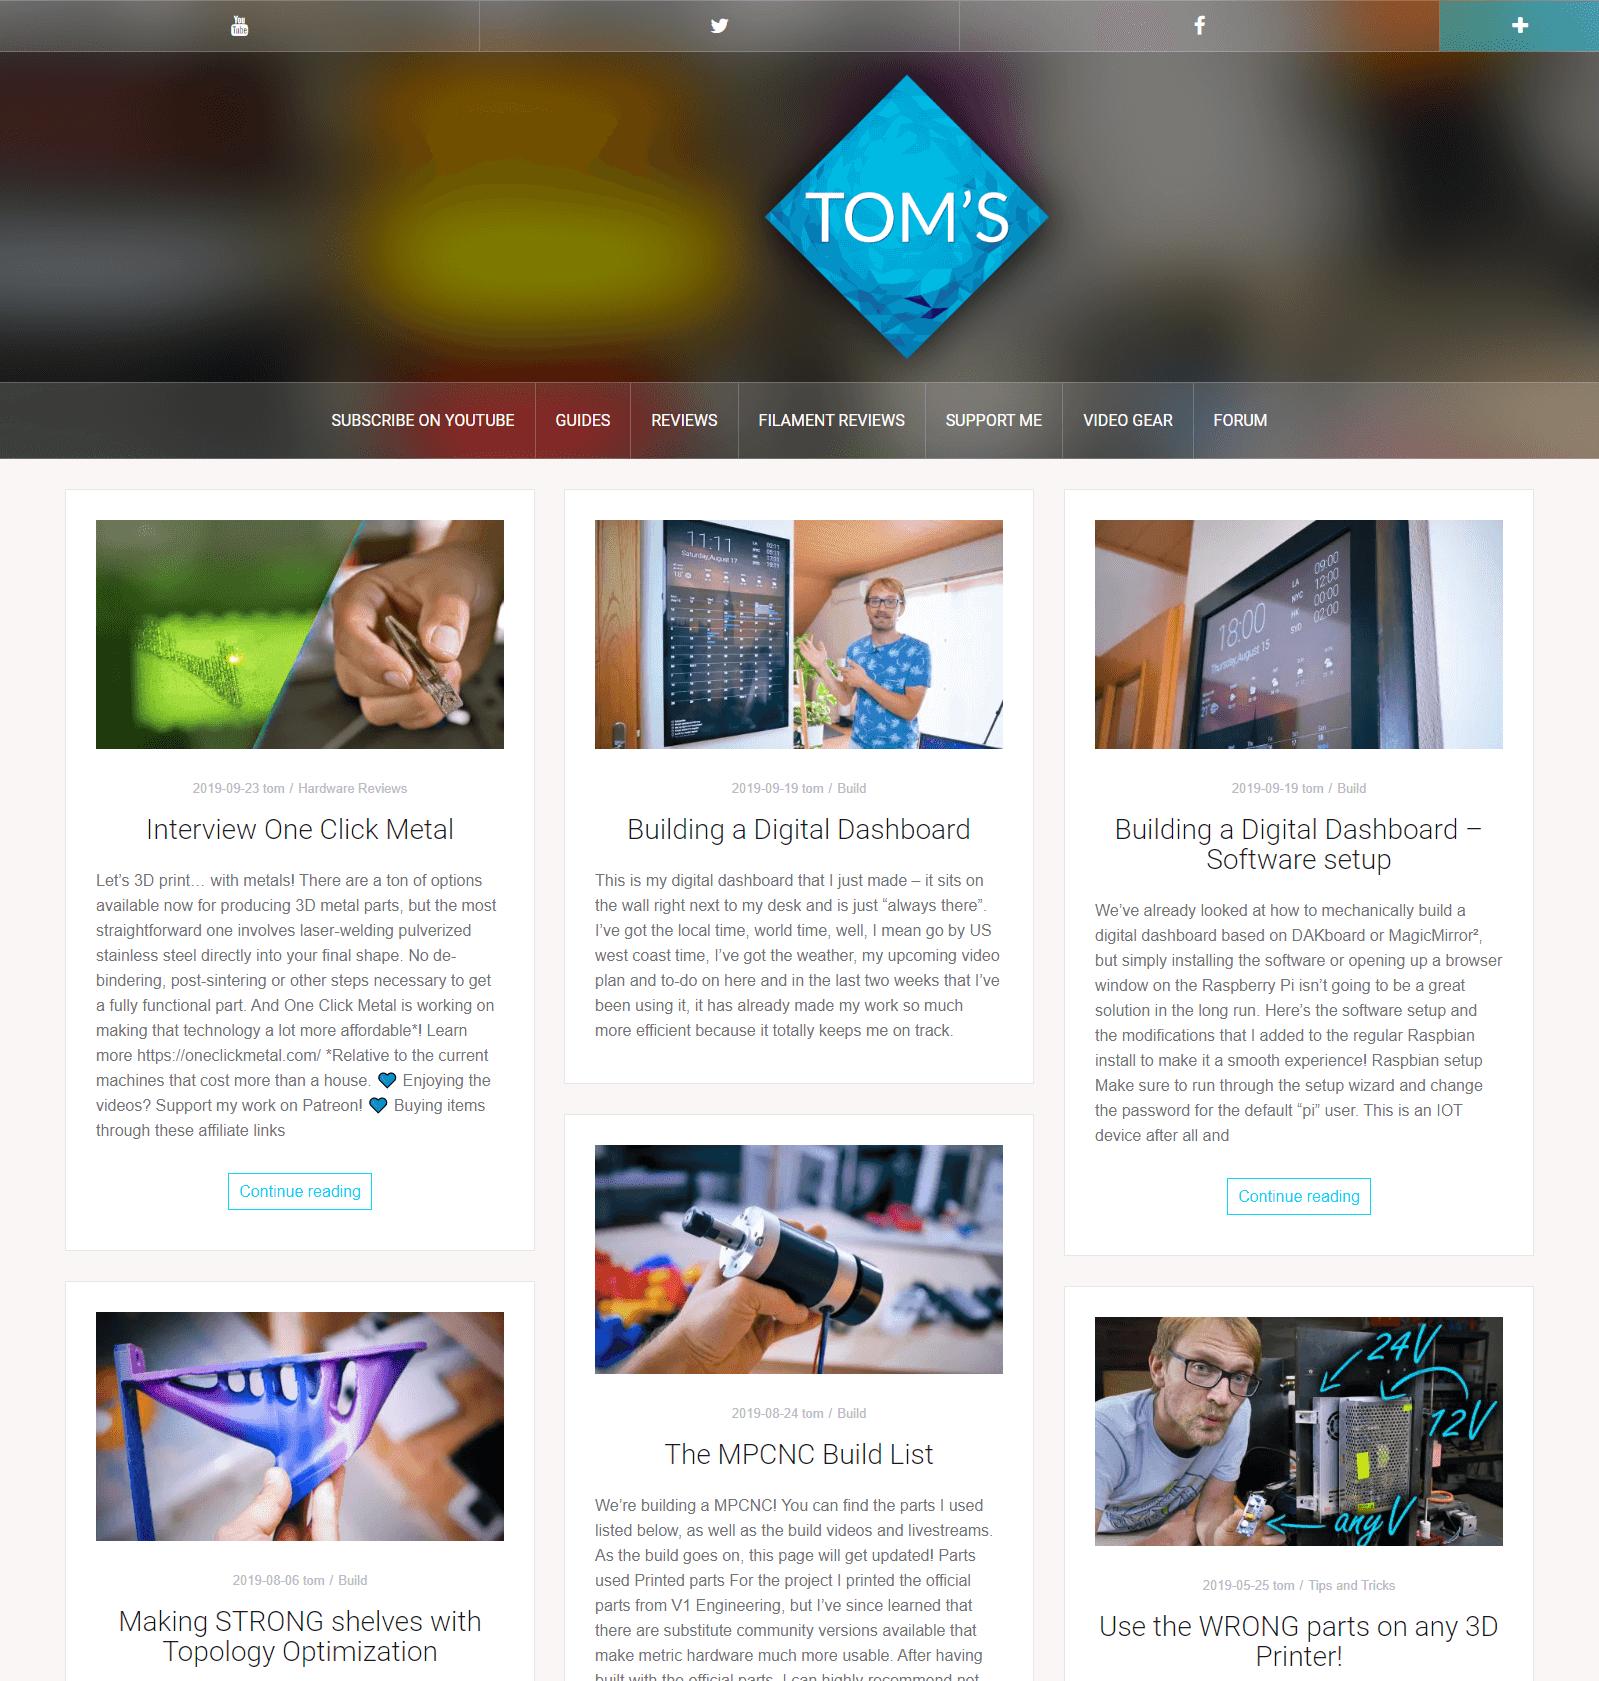 toms3d.org website